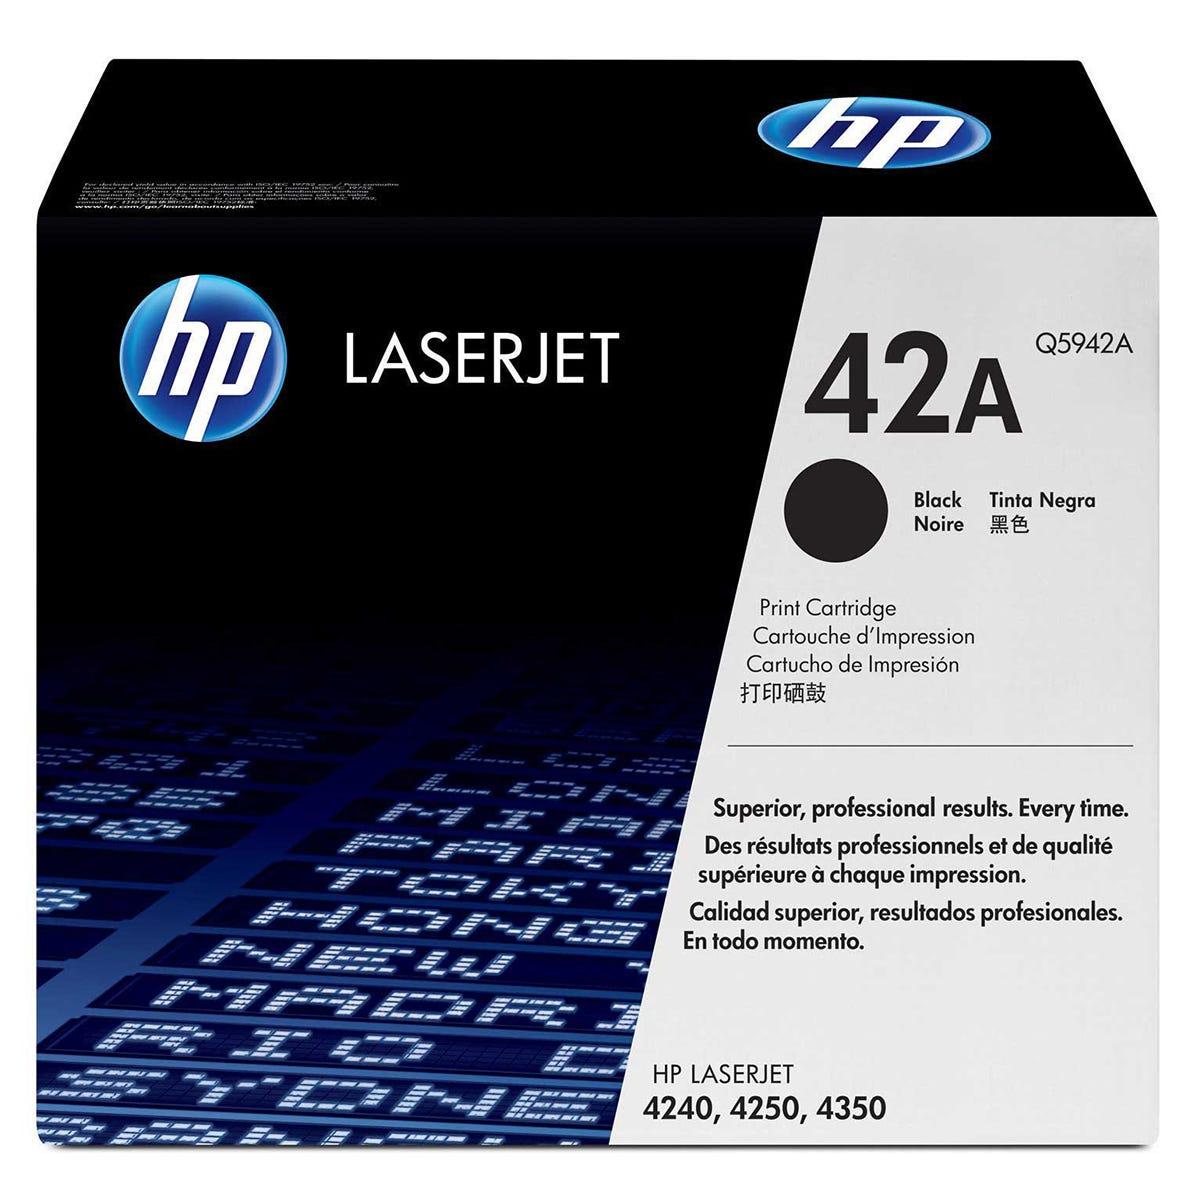 Image of HP 42A Laserjet Printer Ink Toner Cartridge Q5942A, Black